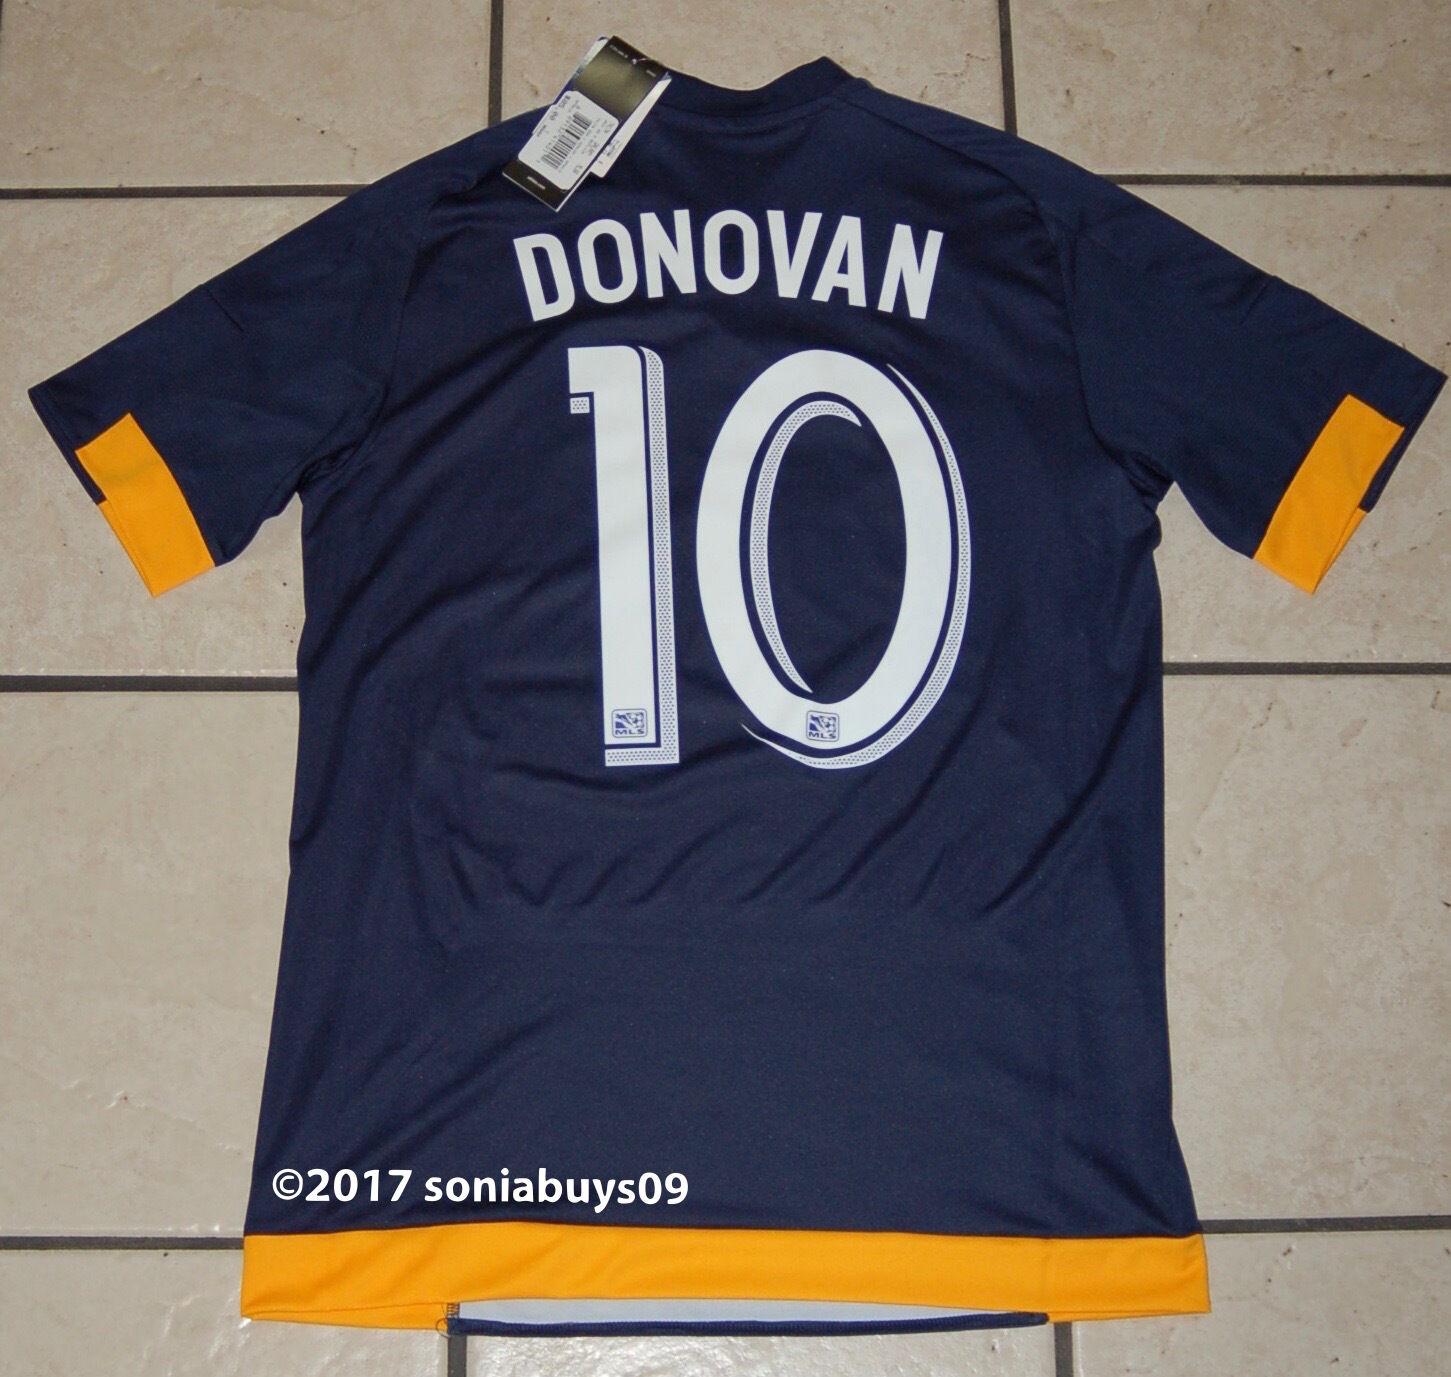 a23d6ecbd0c Adidas Men s DONOVAN MLS L.A Galaxy Away Soccer Jersey